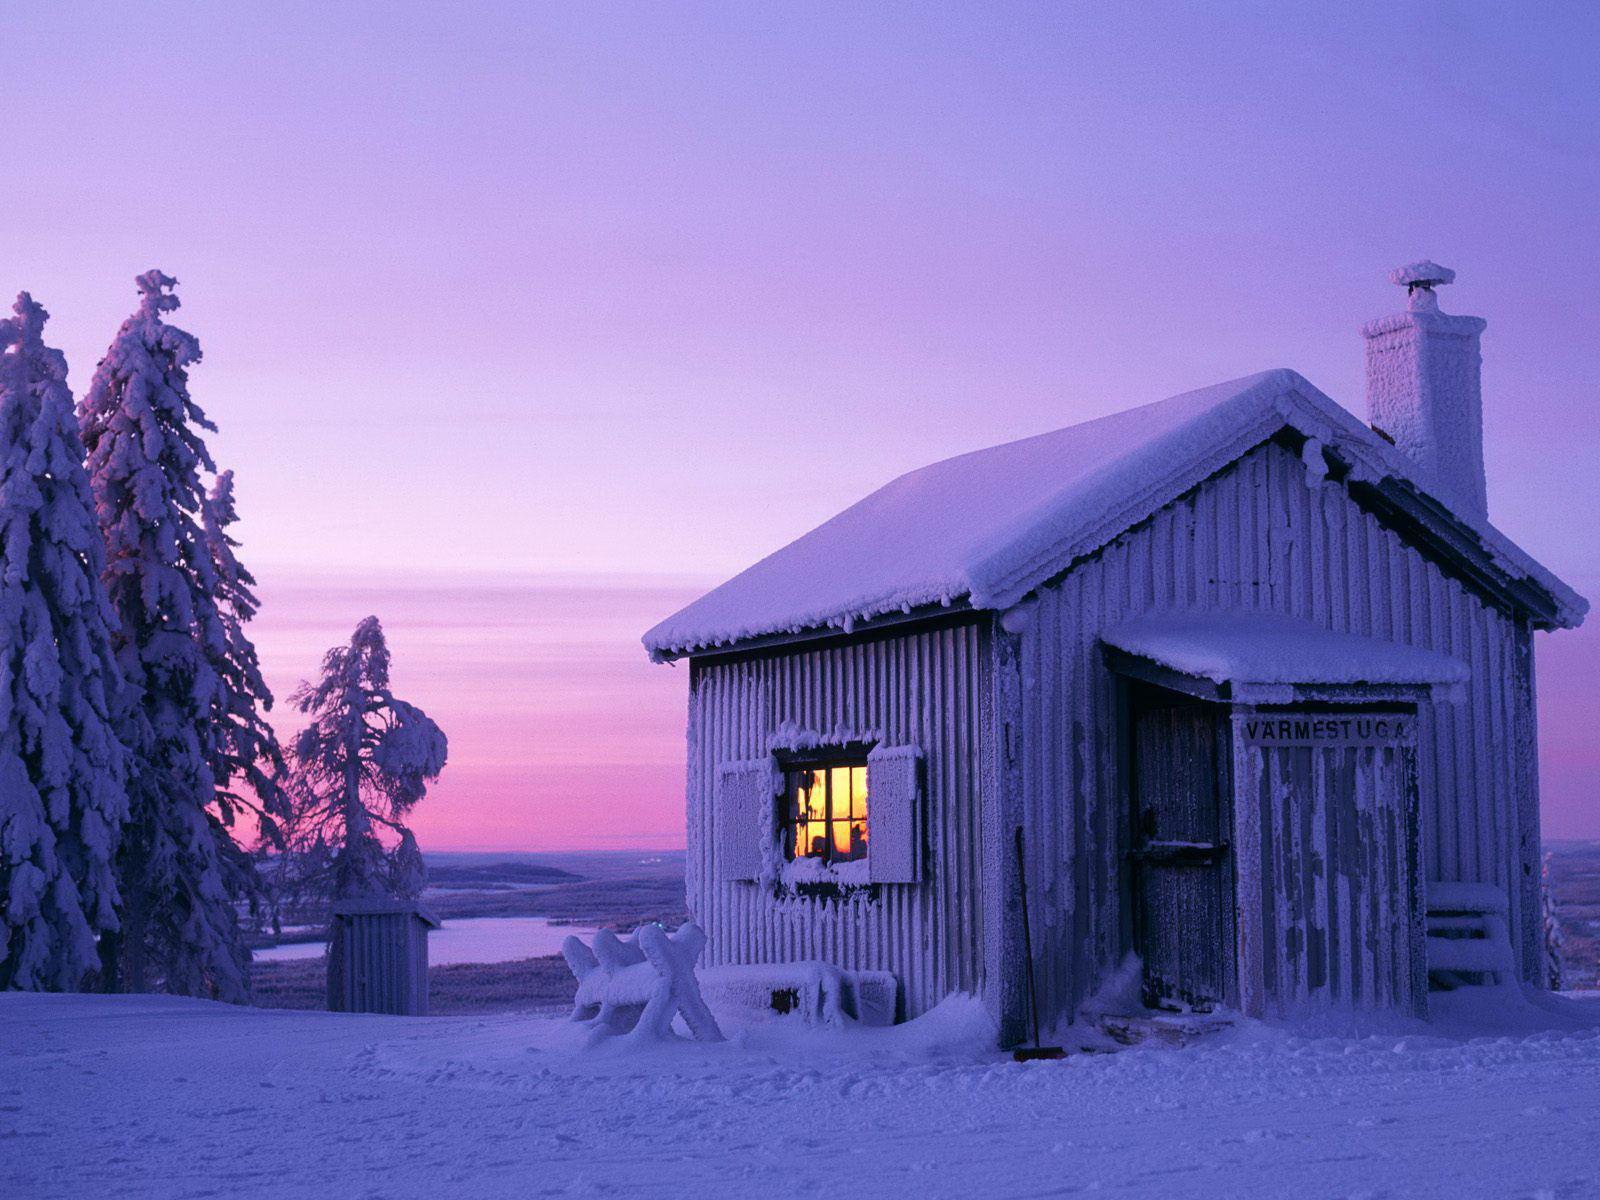 Married To Adventure Headed to Sweden TomorrowEntirely Unprepared 1600x1200